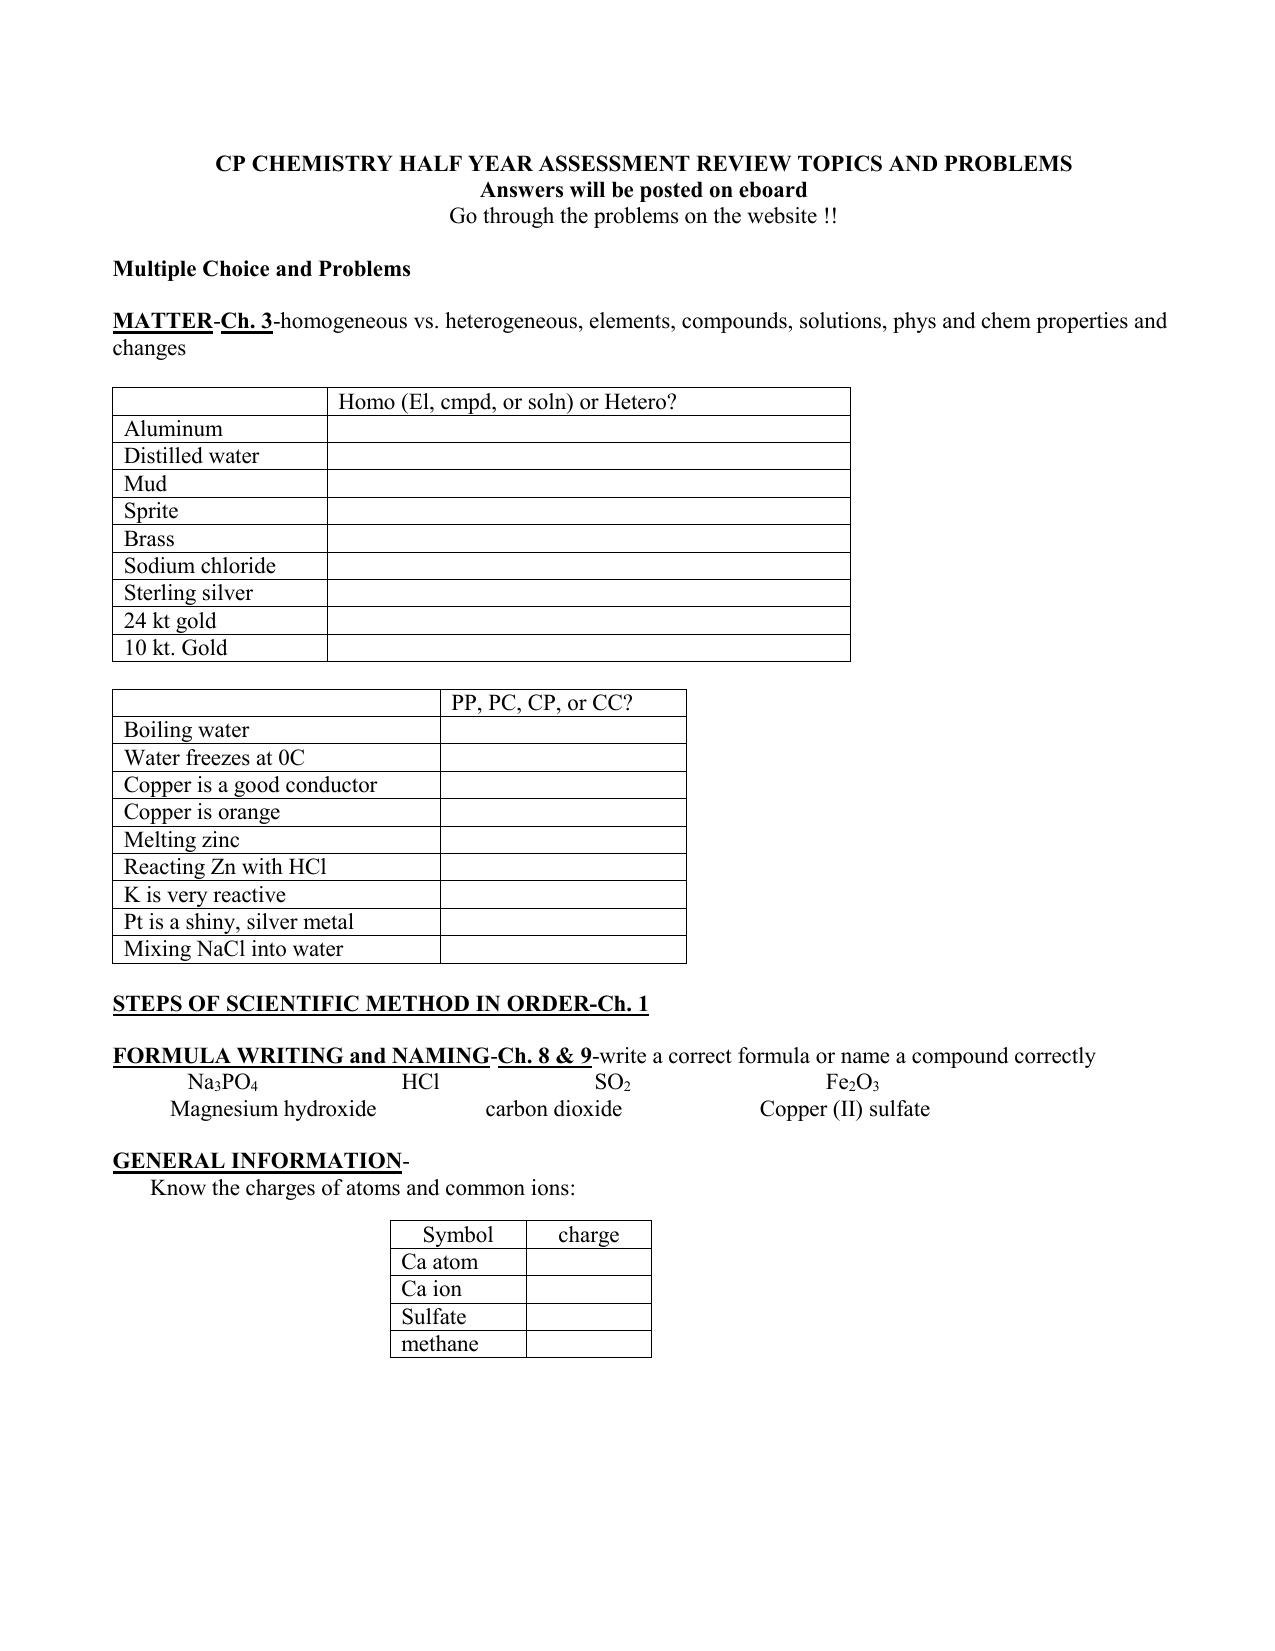 Homogeneous Vs Heterogeneous Matter Worksheet Answers